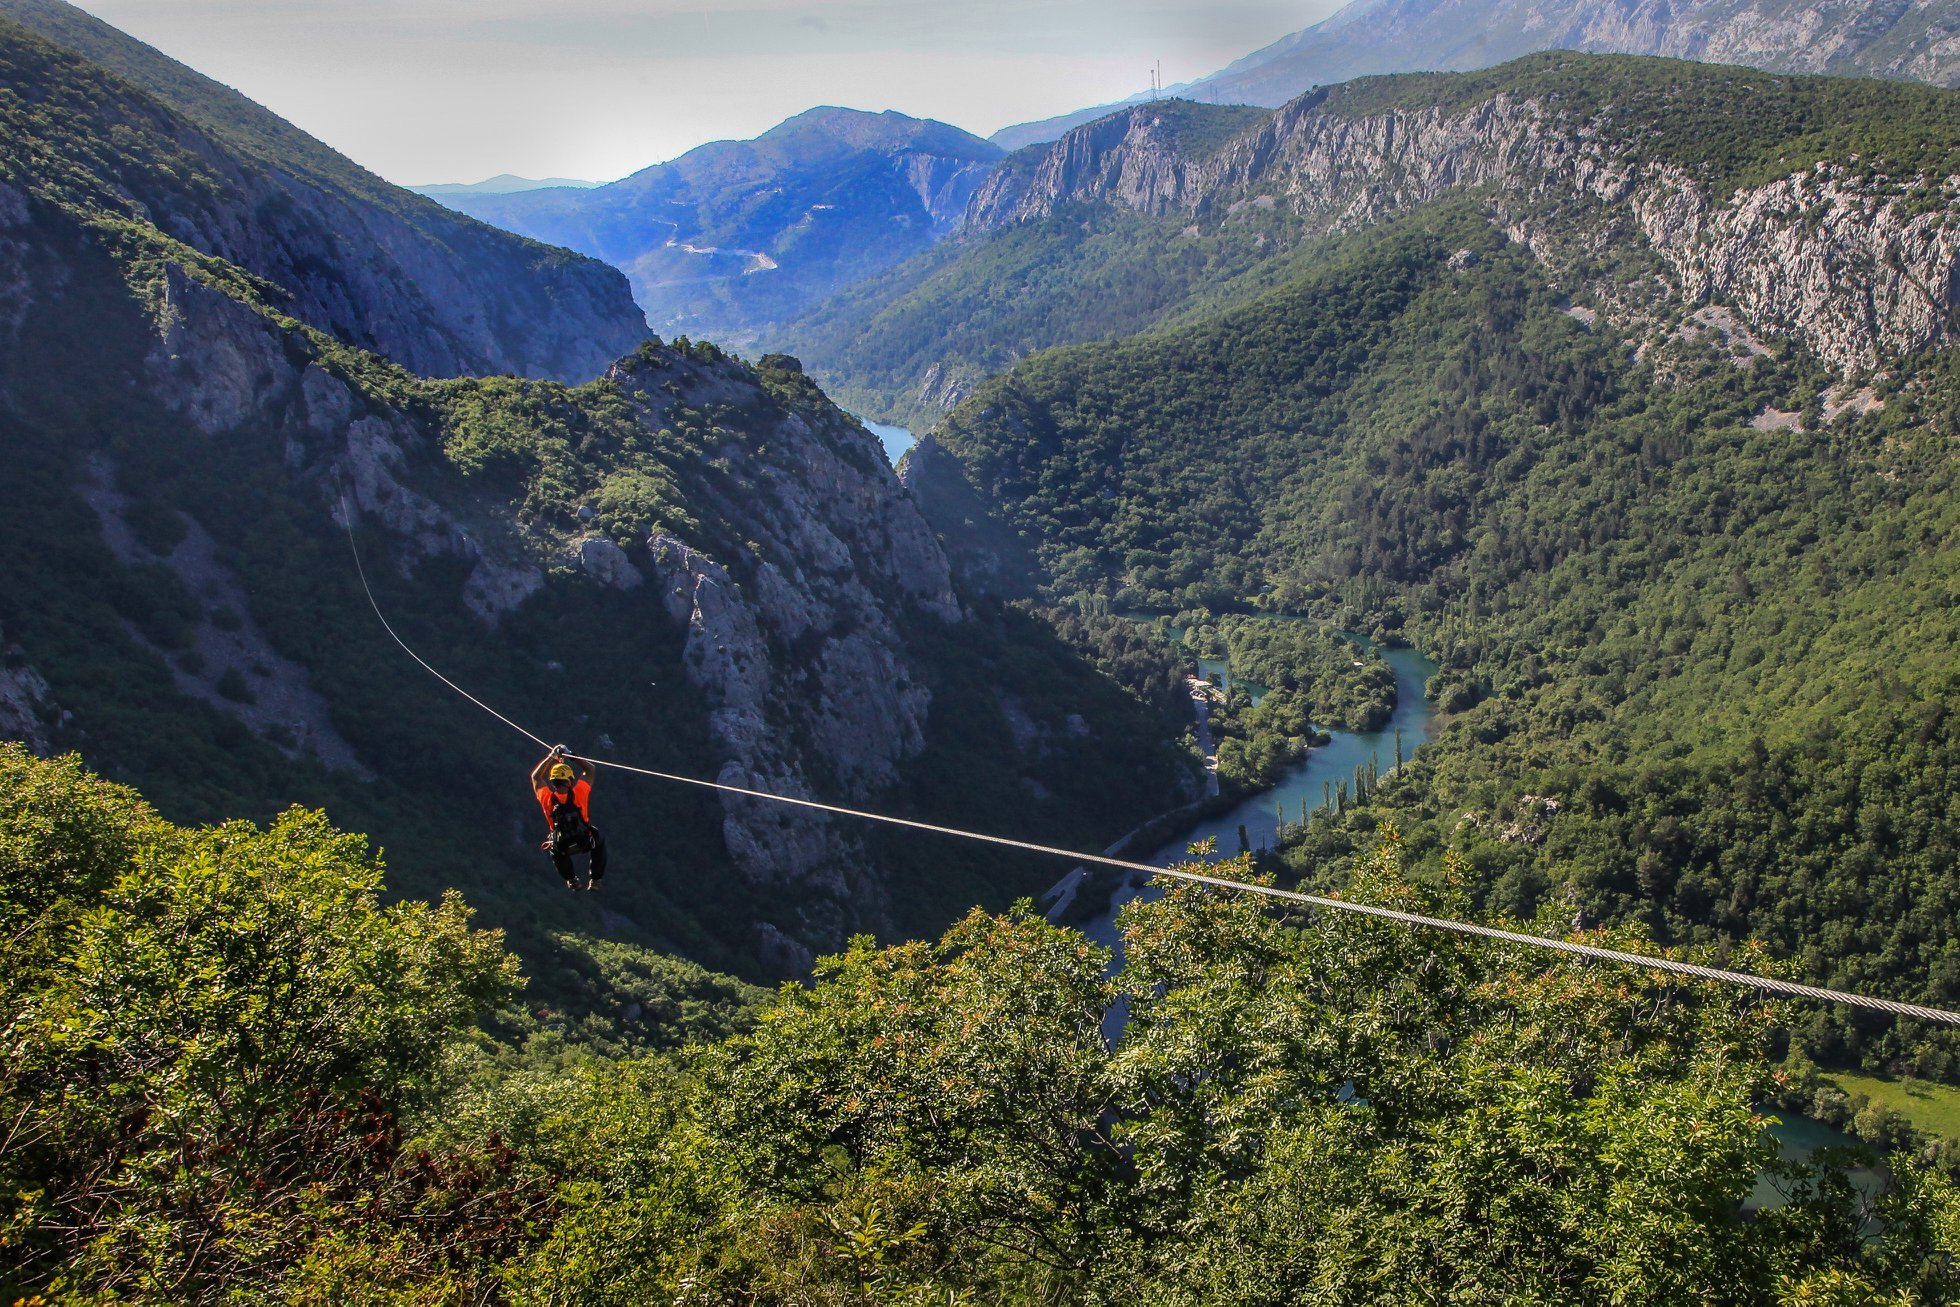 In pictures: Top 54 coolest outdoor pursuits in Croatia